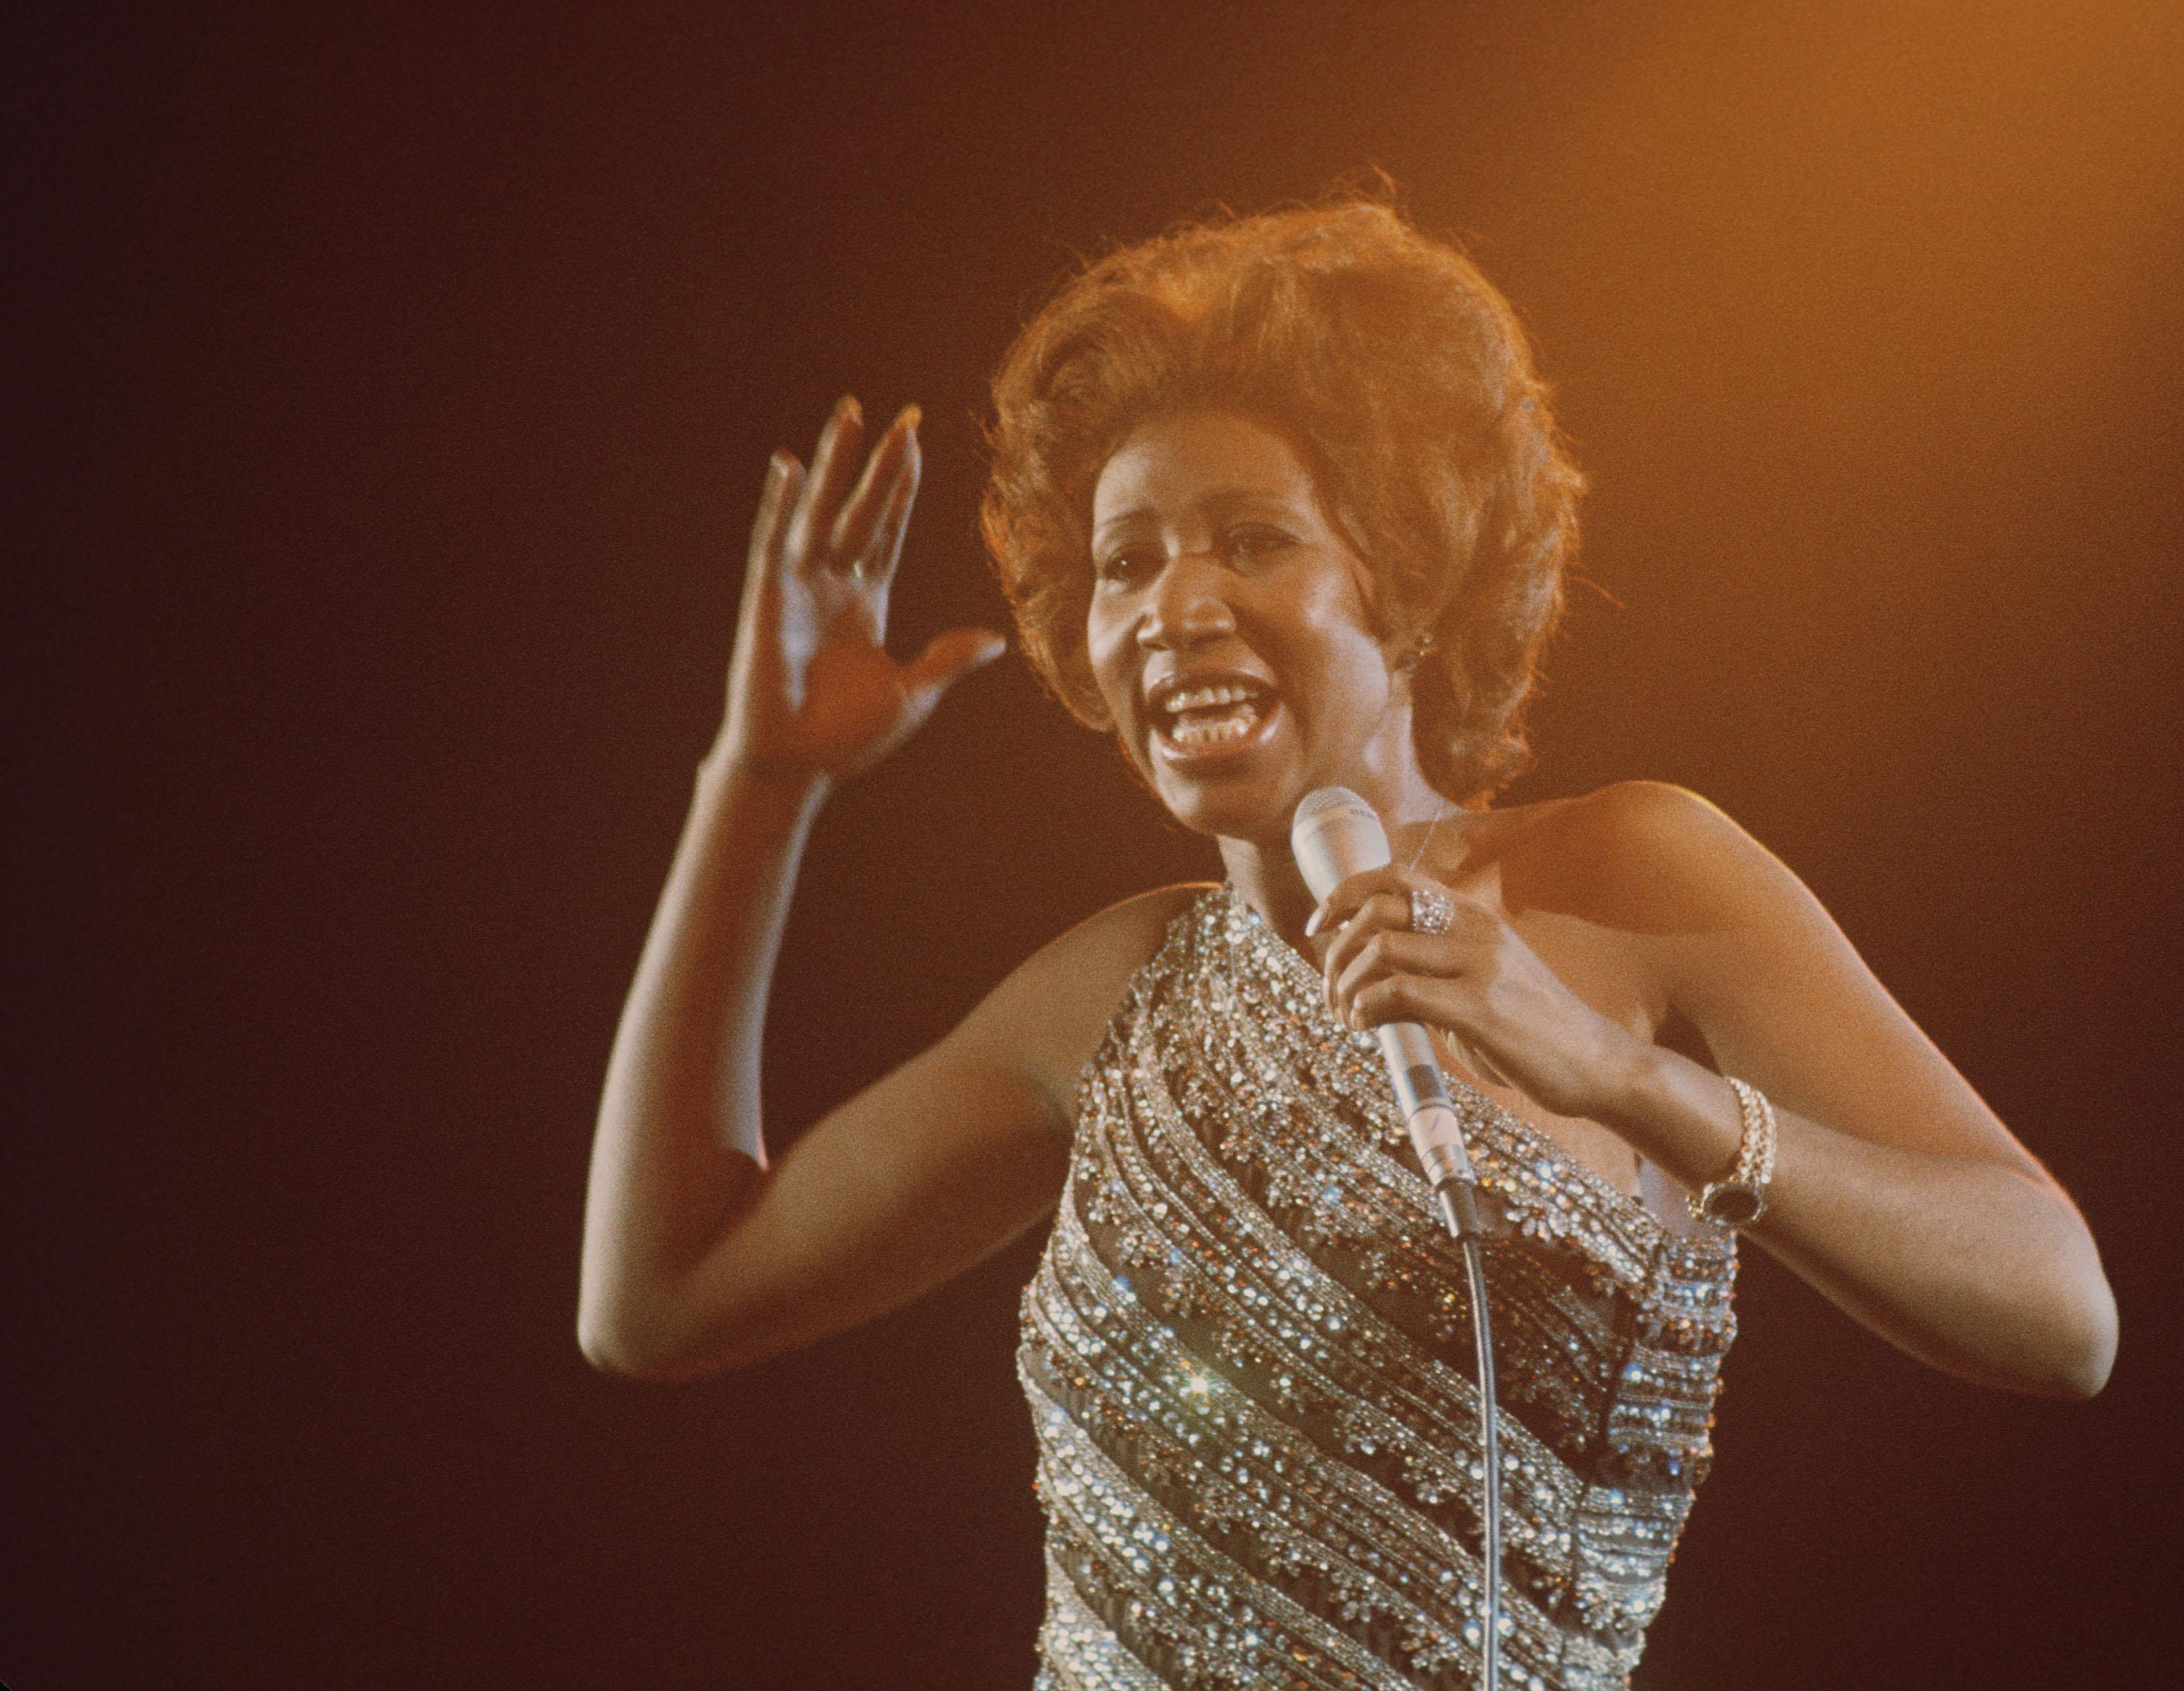 aretha franklin 1967 performance photos